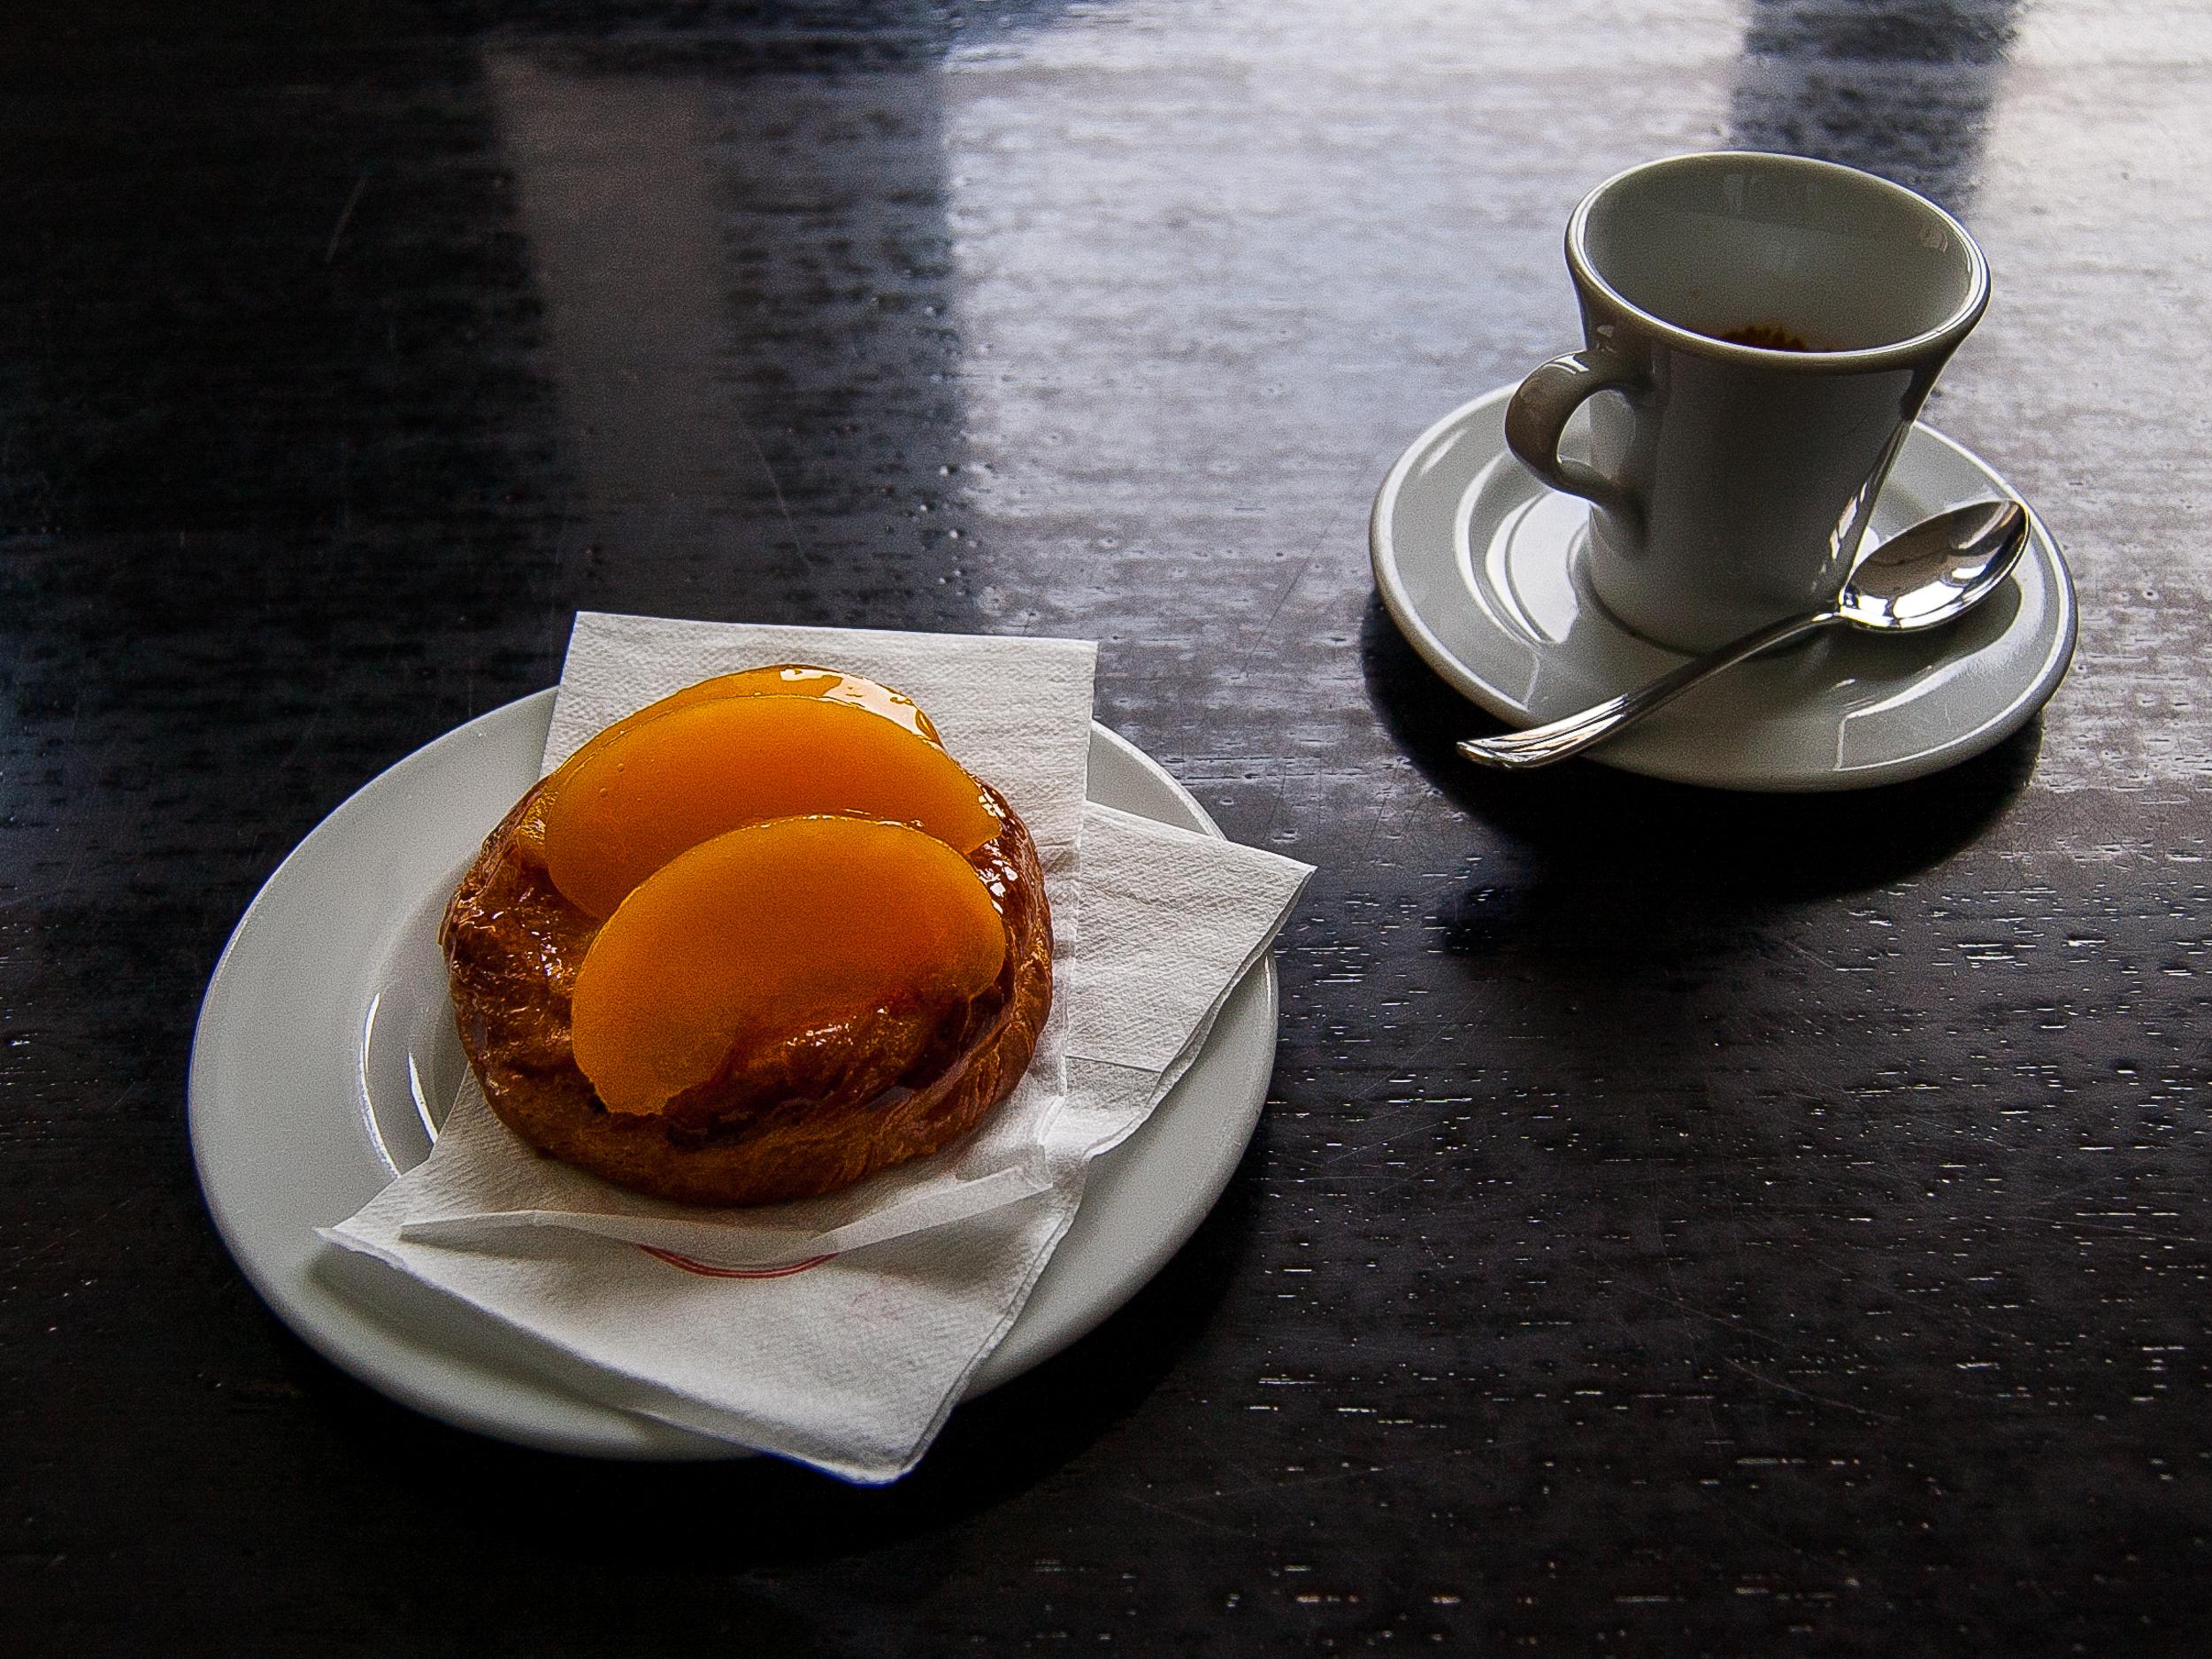 Breakfast at a café.